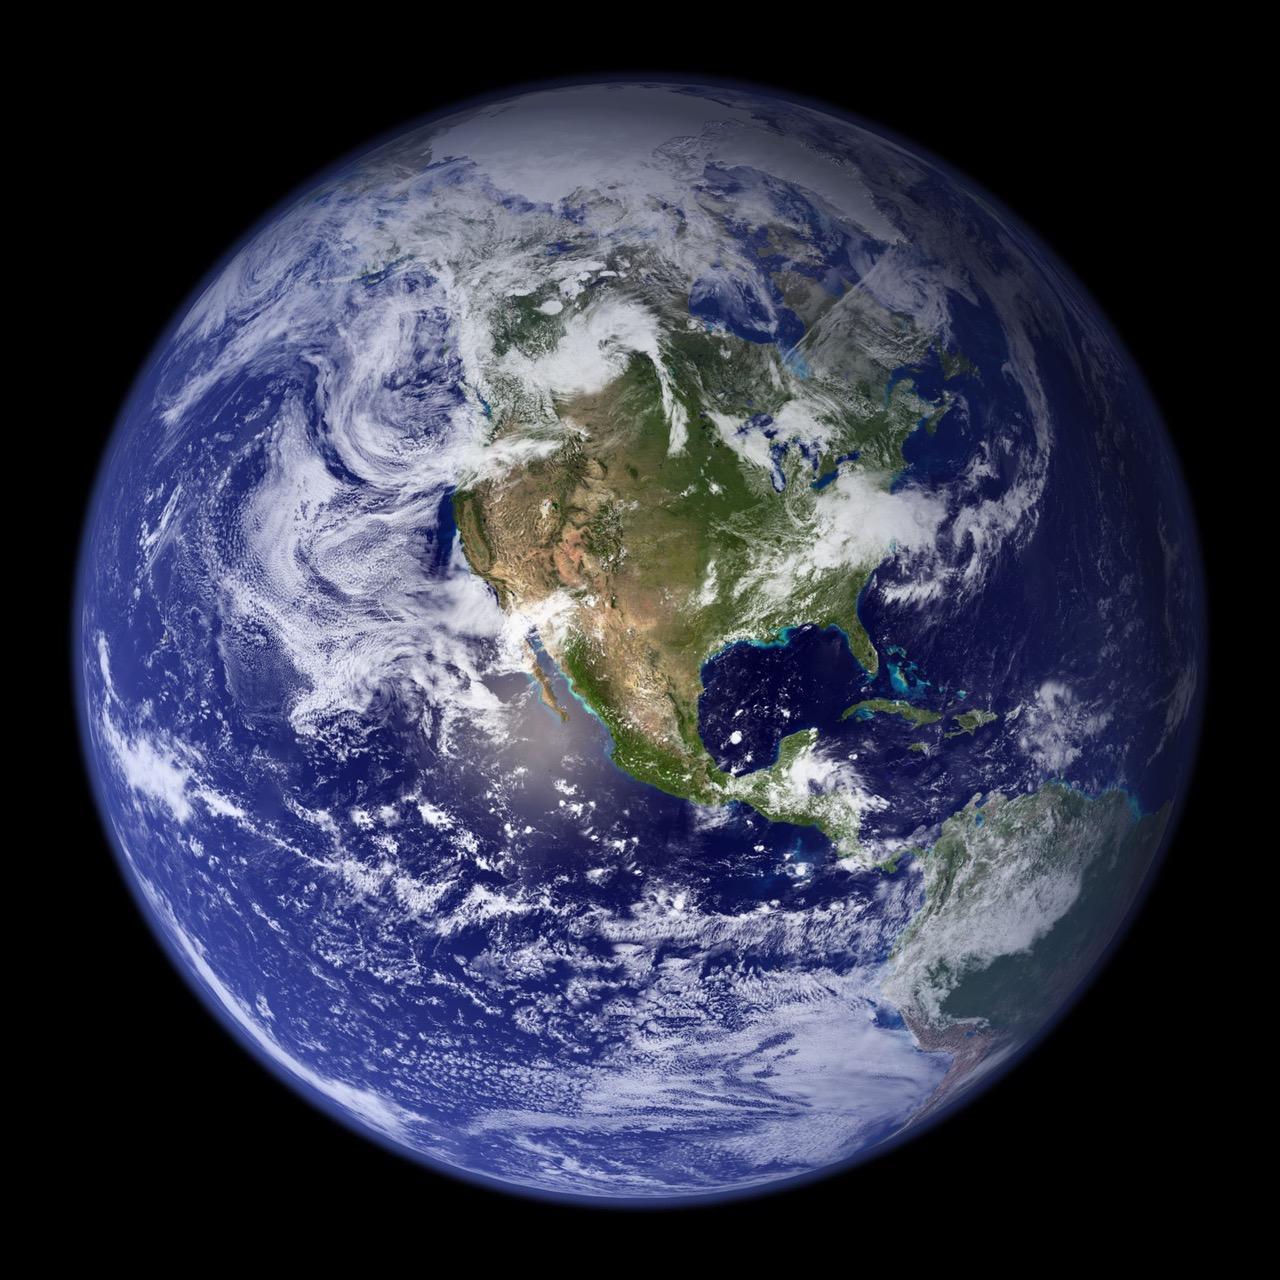 earth-blue-planet-globe-planet-87651-1492178809483.jpeg